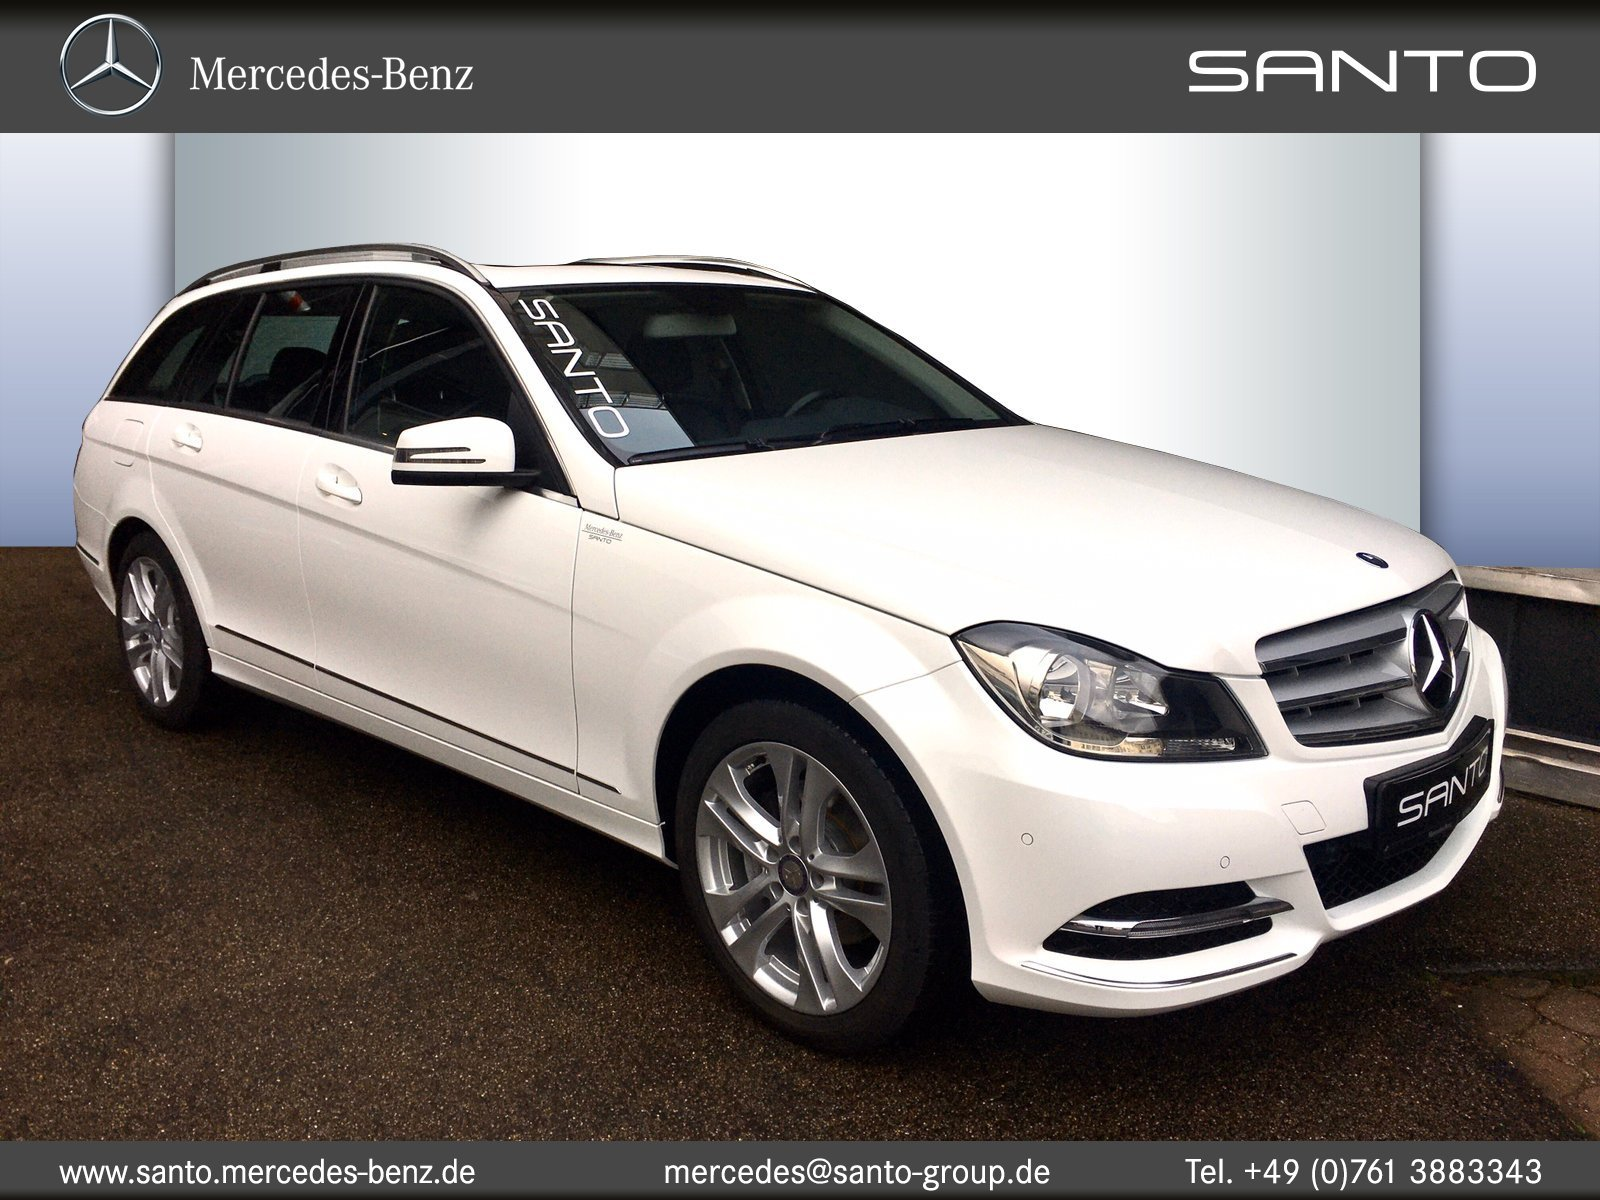 Mercedes-Benz C 250 T AVANTGARDE + NAVI + PANO +AUTOMATIK+ PDC, Jahr 2013, Benzin